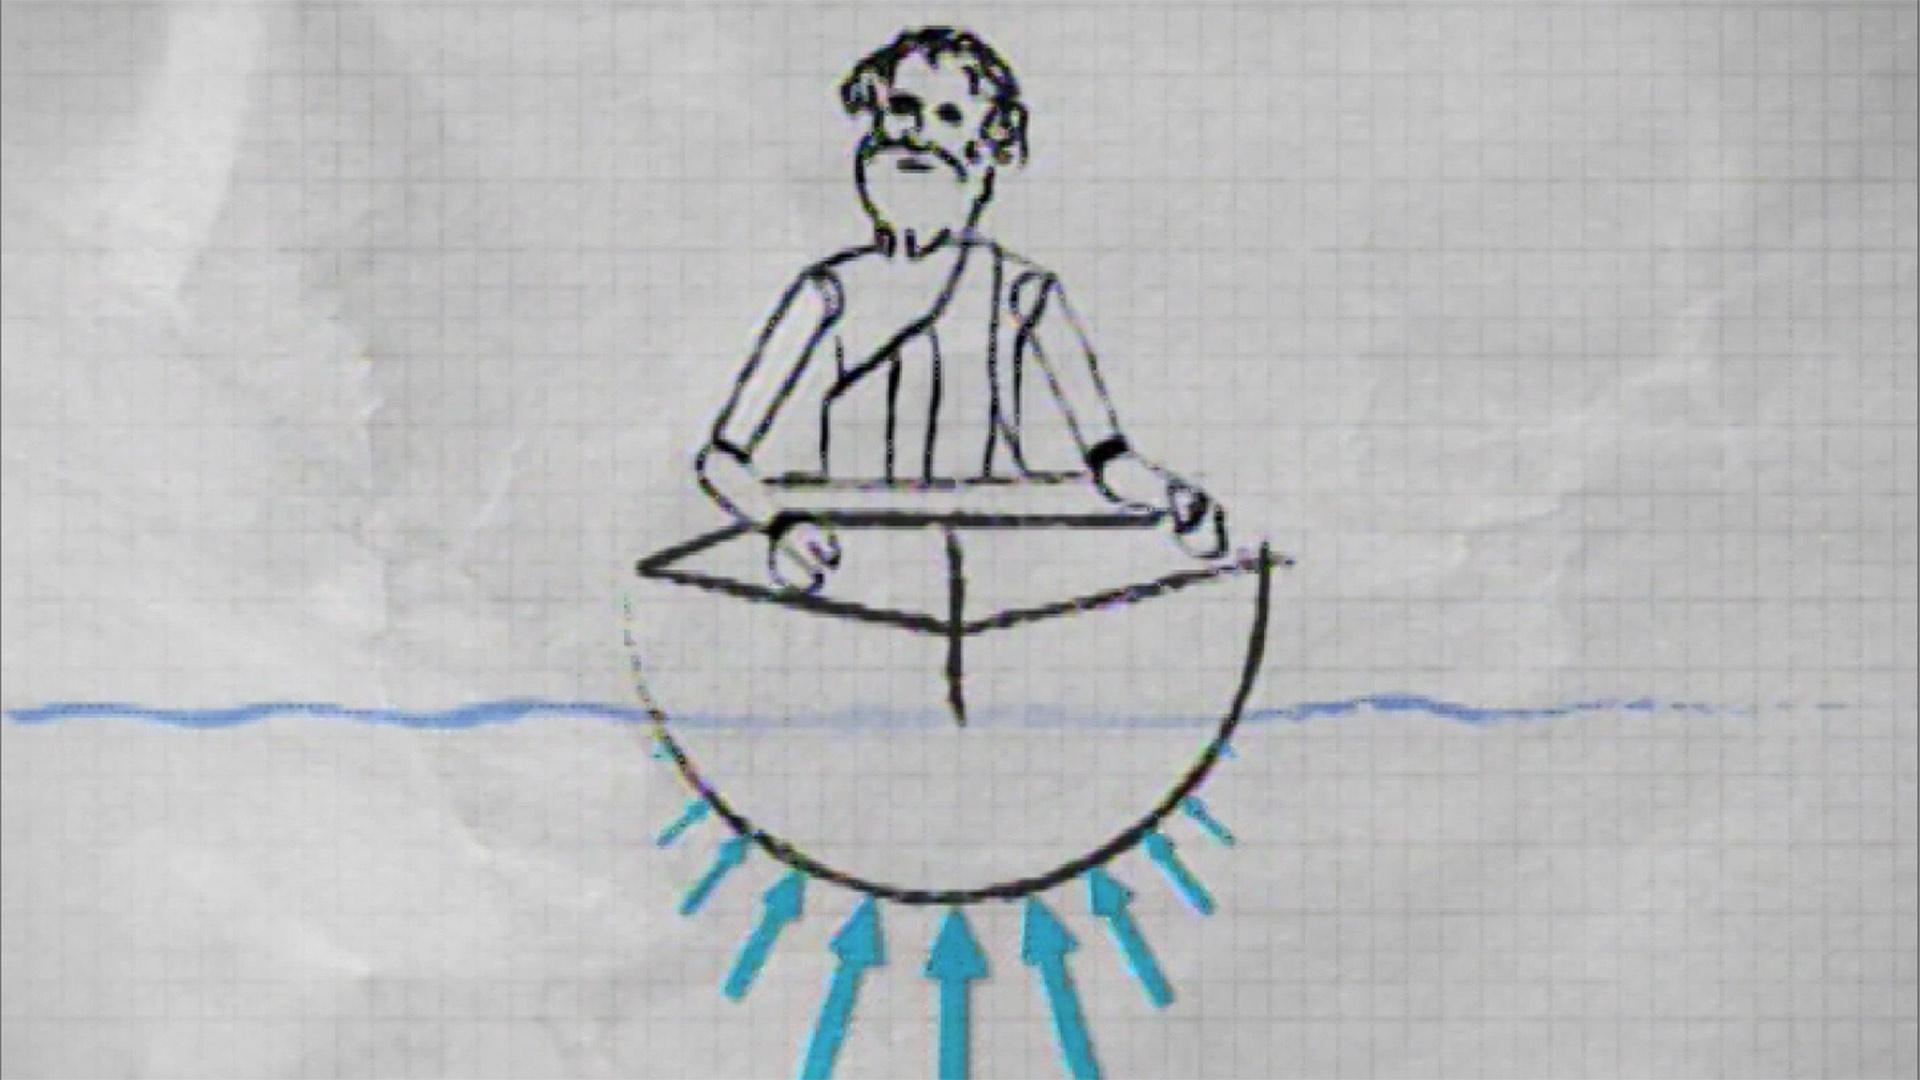 hight resolution of pontoon boat side sketch